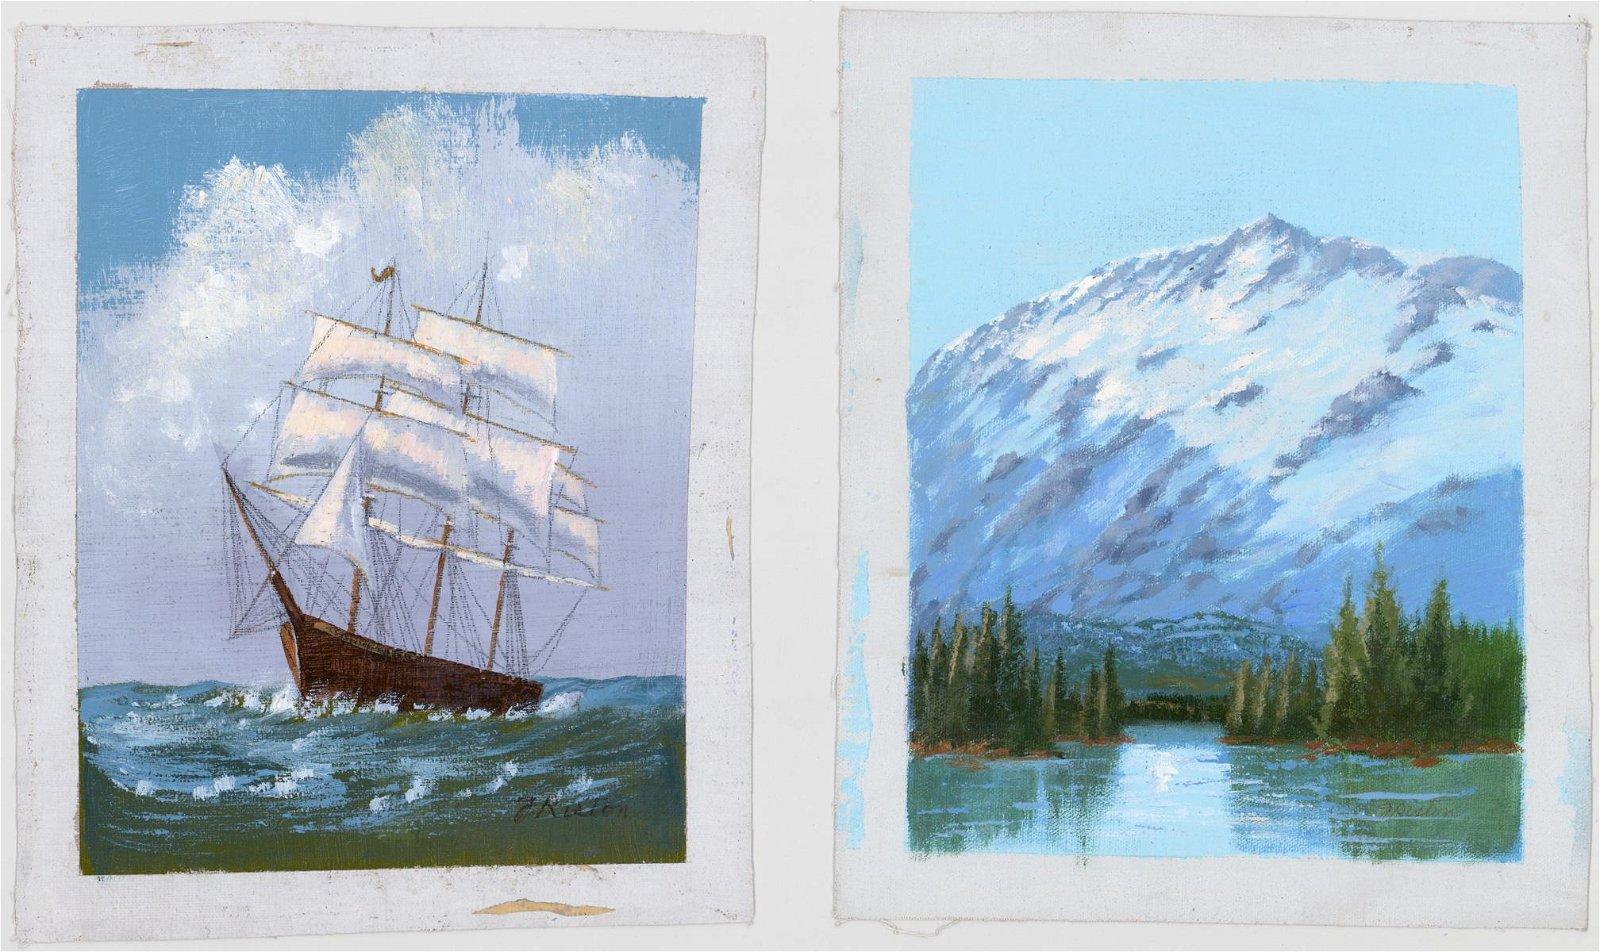 J. Riston Oils on Canvas [Mountain, Ship]